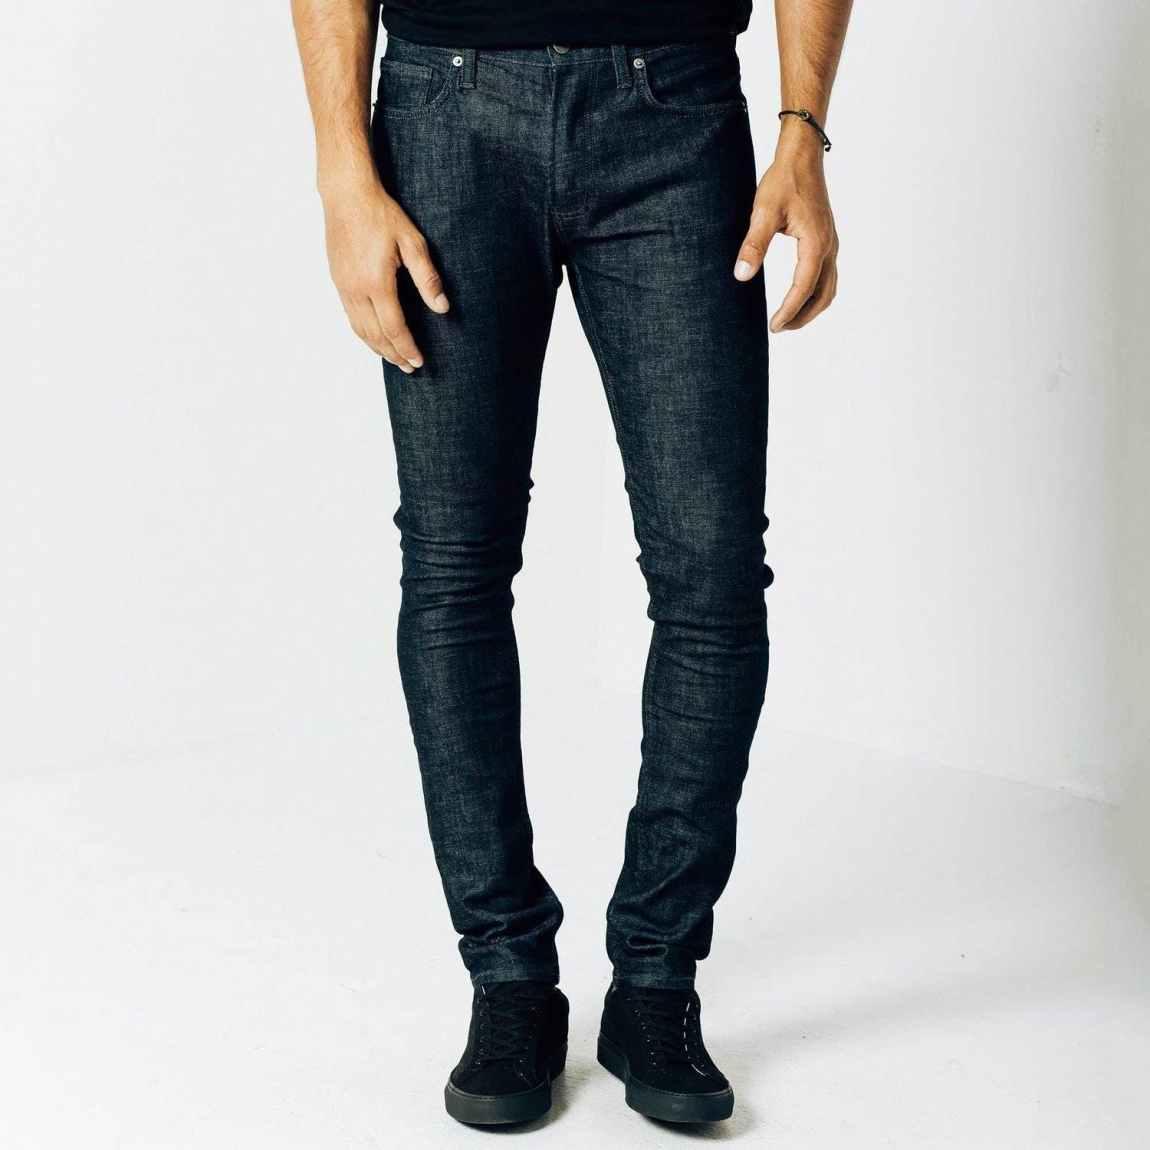 dstld, dstld jeans, raw denim, tonal stitching, selvedge denim, sanfornized denim, dark blue jeans, skinny jeans